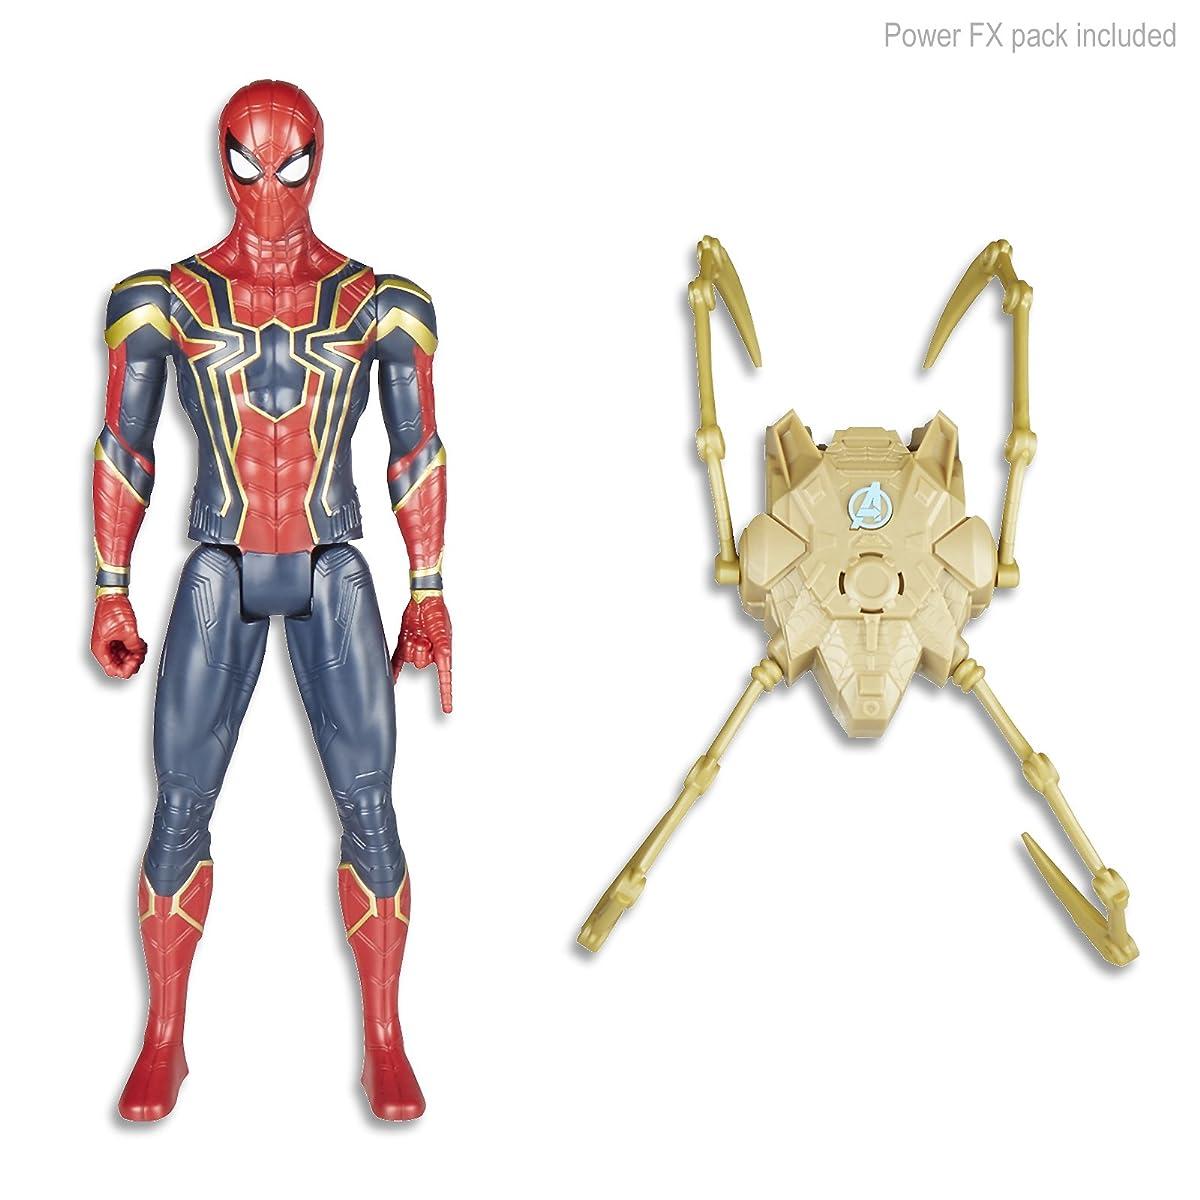 Marvel Avengers: Infinity War Titan Hero Power FX Iron Spider